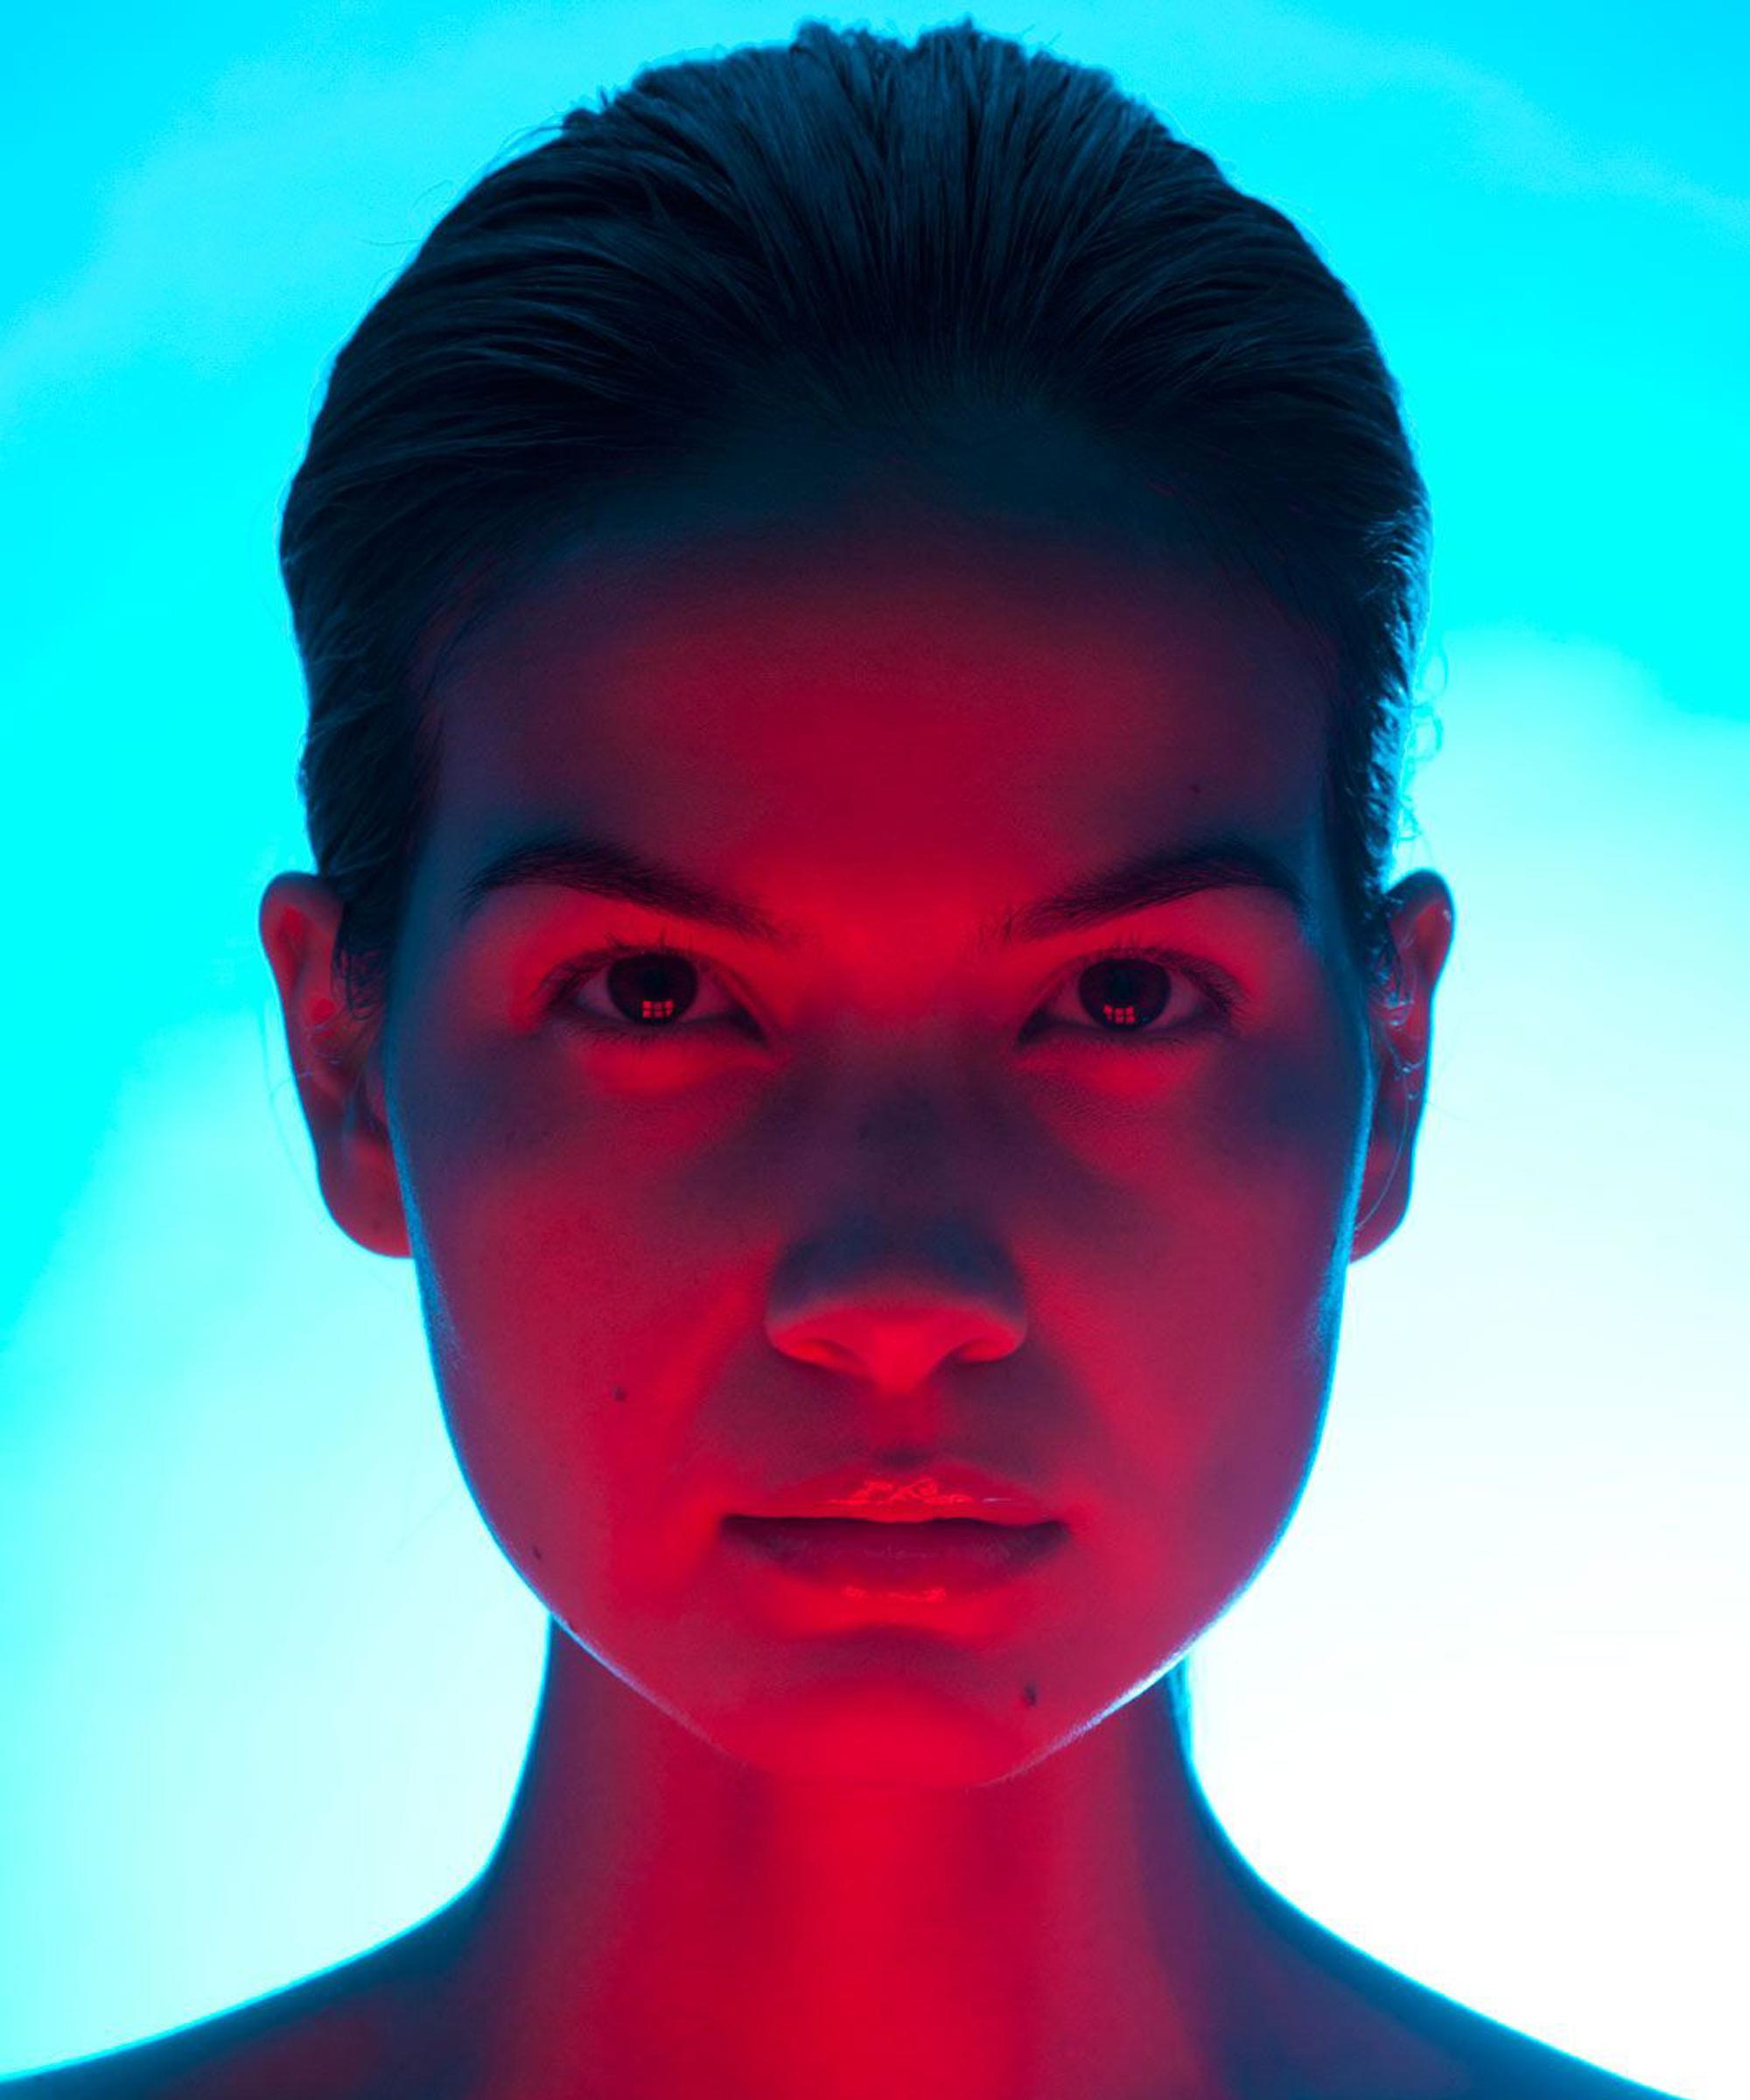 Pin By Hannah Ayrault On Strangers Blue Light Acne Blue Light Acne Treatment Blue Light Therapy